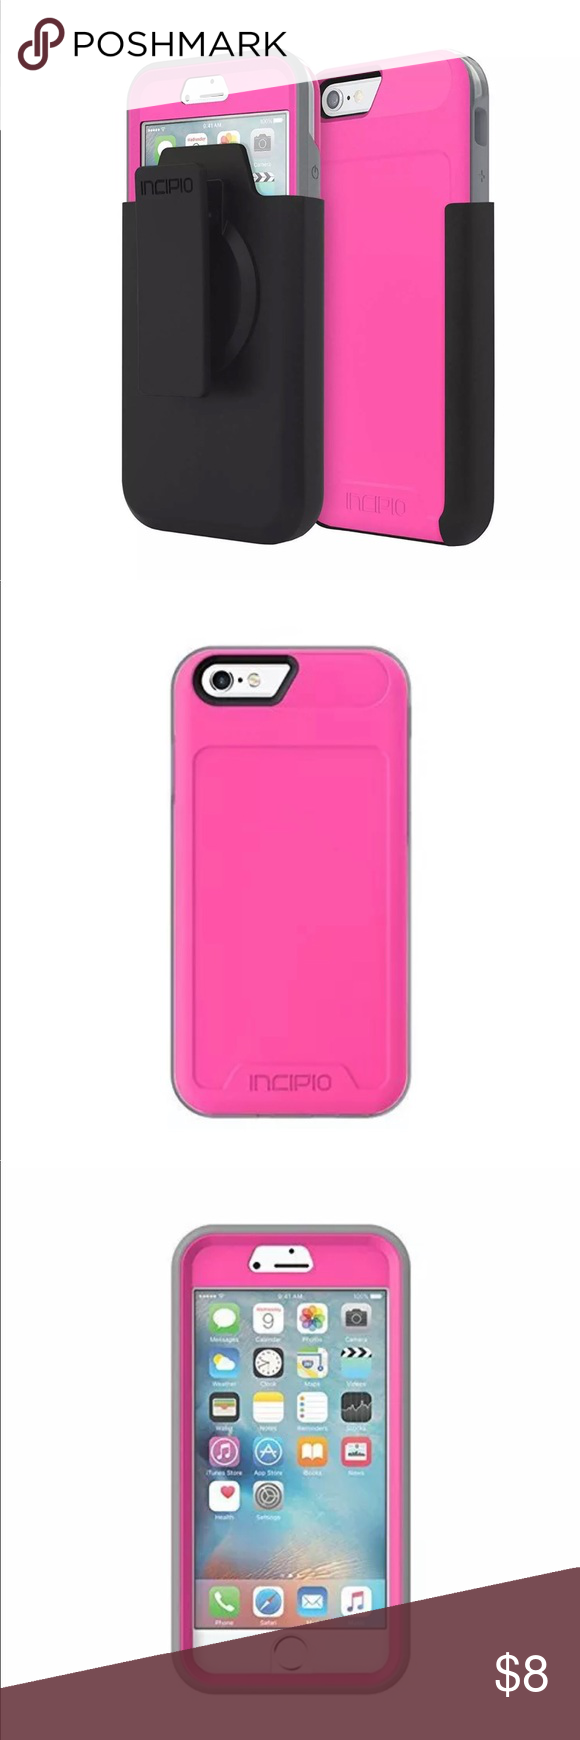 Iphone 6 6s Premium Heavy Duty Case Phone Case Accessories Iphone 6 Iphone